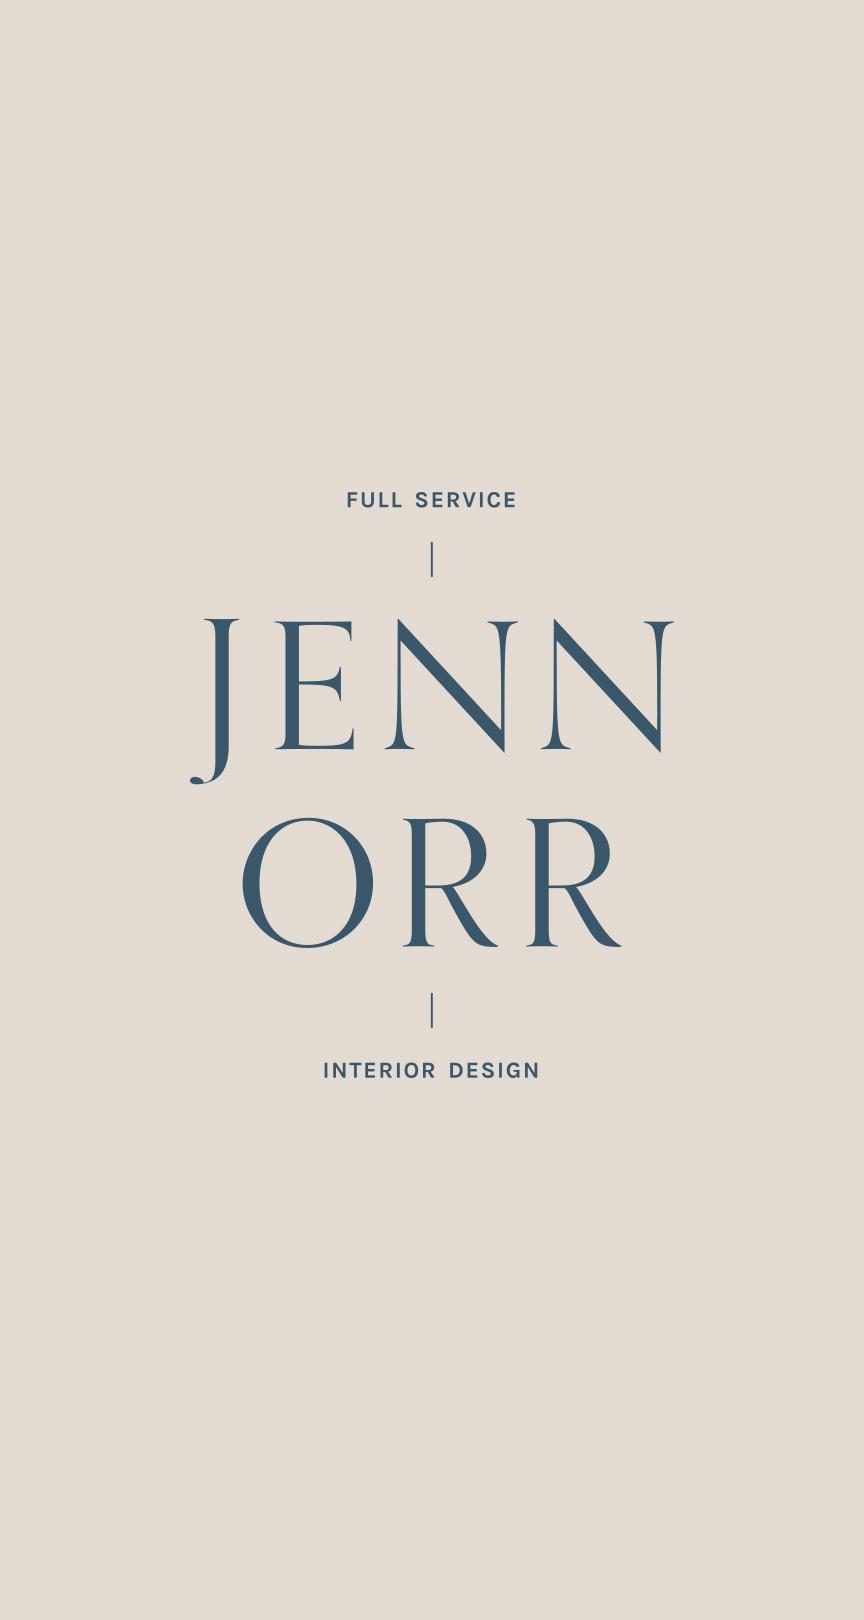 logo designs | Timeless, Classic, Neutral brand design for interior designer | by Reux Design Co.